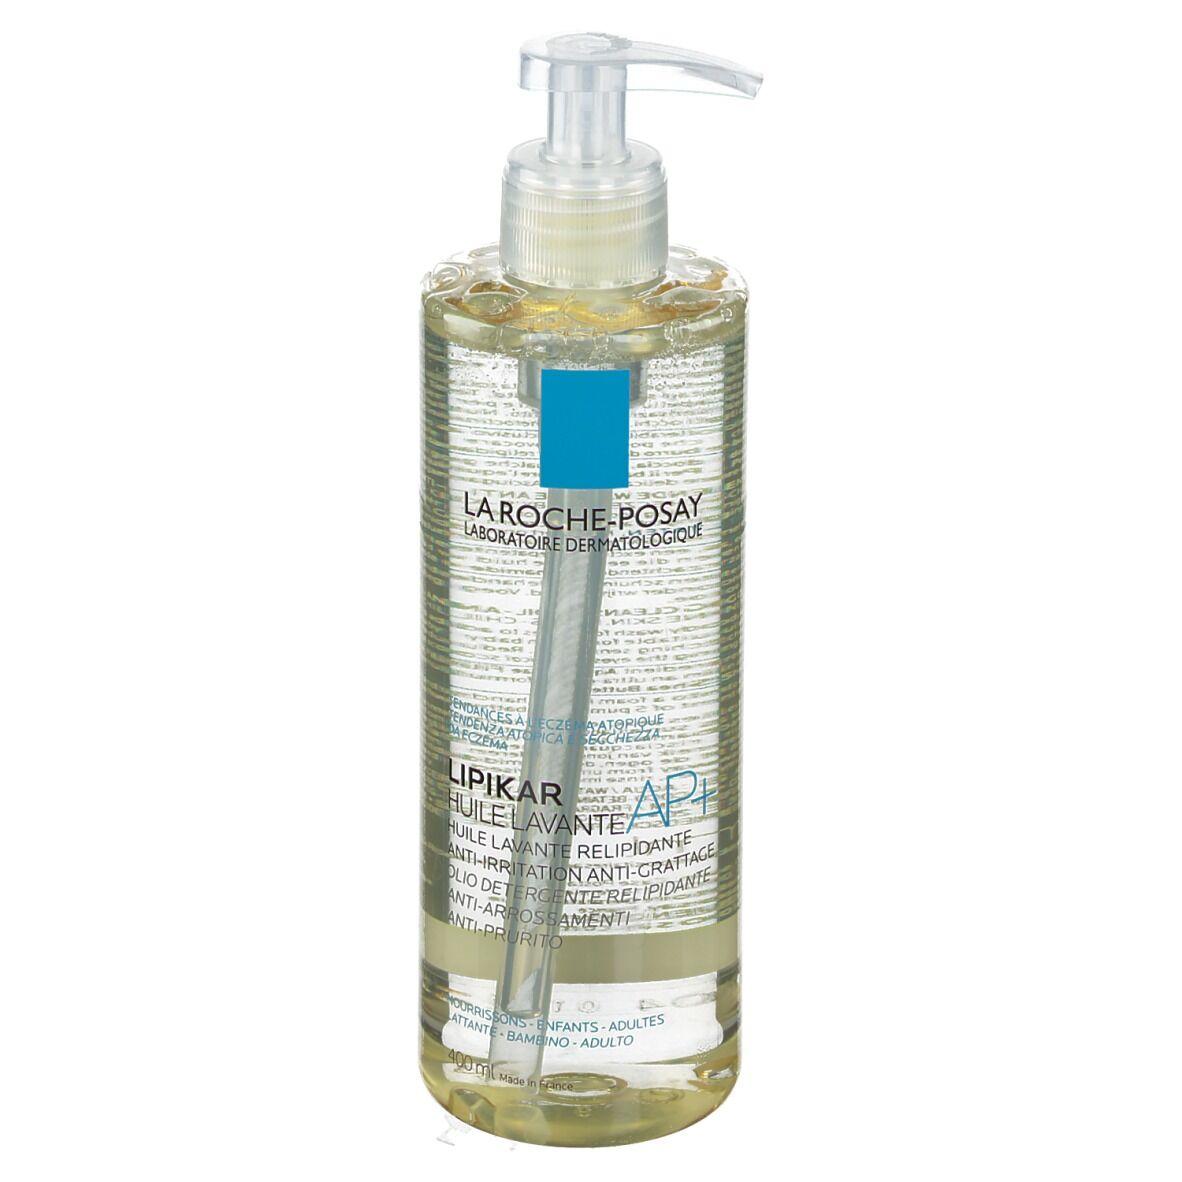 L'orealBelgilux-DivisionCosmetiqueActive La Roche-Posay Lipikar AP+ Huile Lavante ml huile